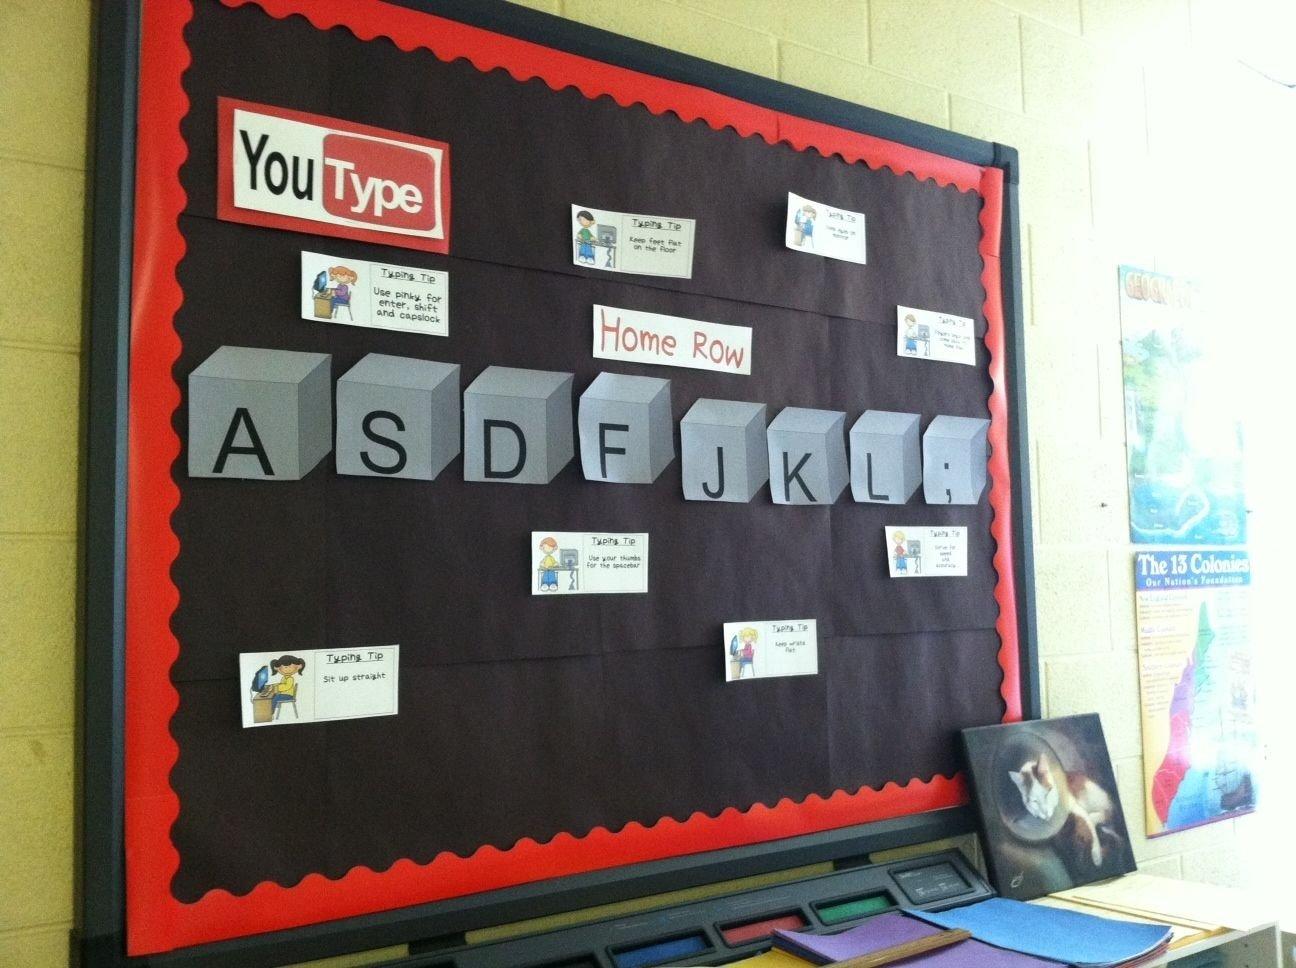 10 Stylish Technology In The Classroom Ideas youtype bulletin board typing keyboarding technology education 2020